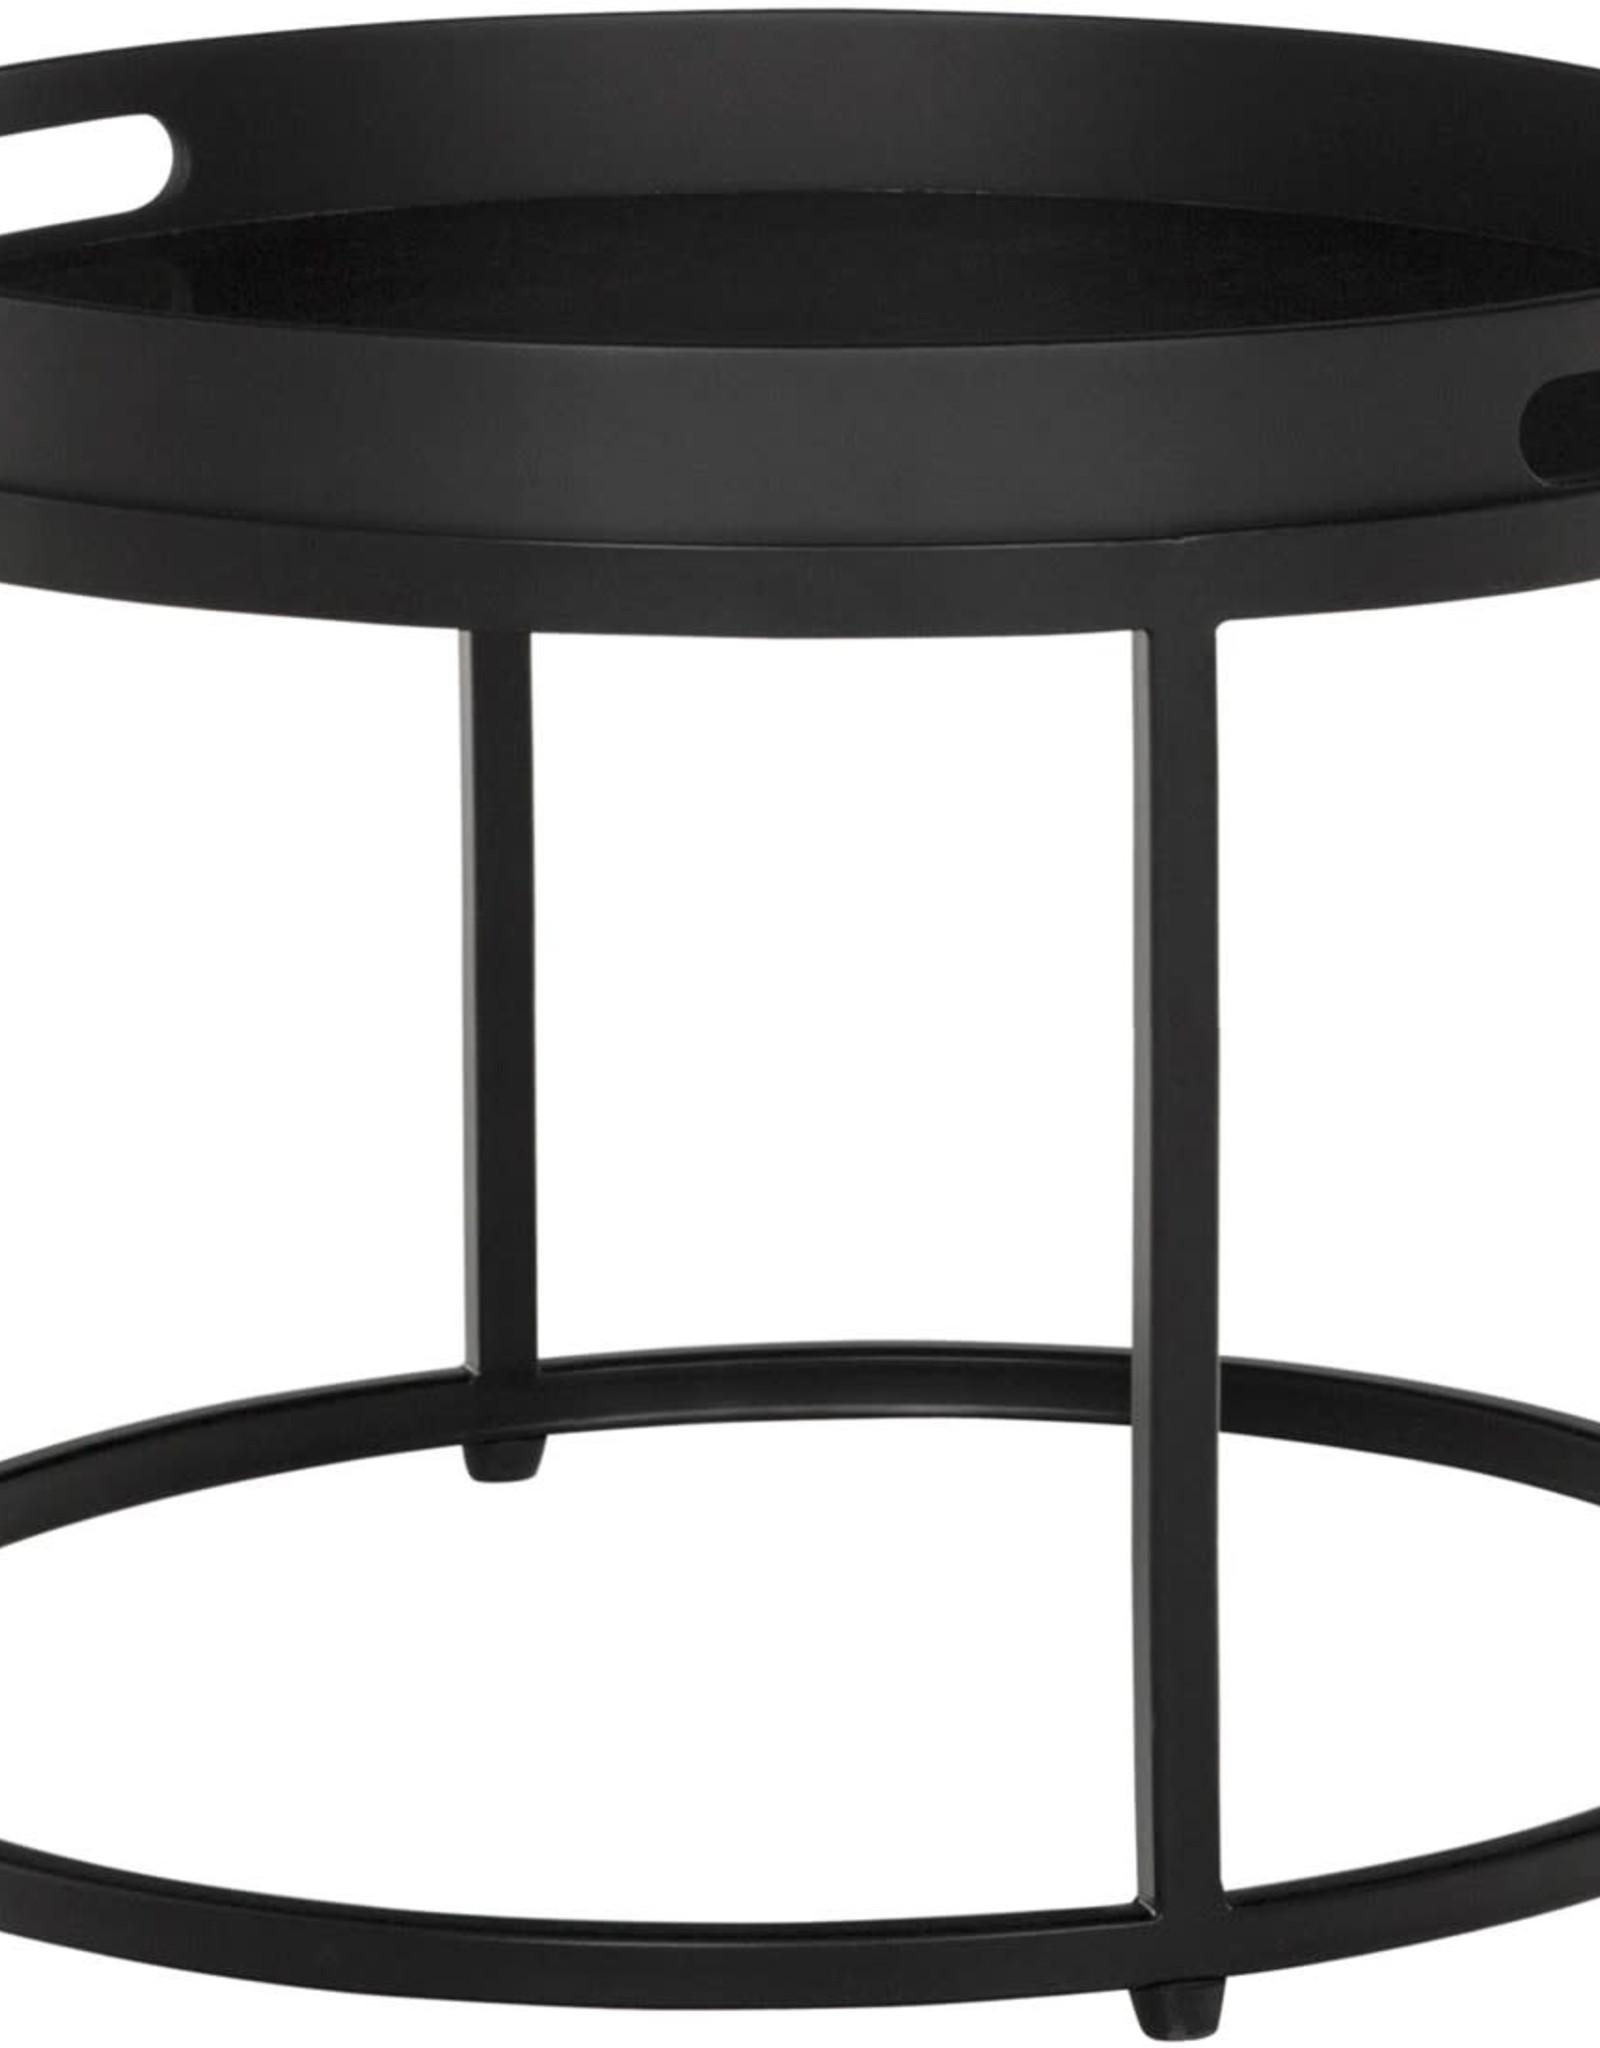 DTP - Coffe table golden fiber small